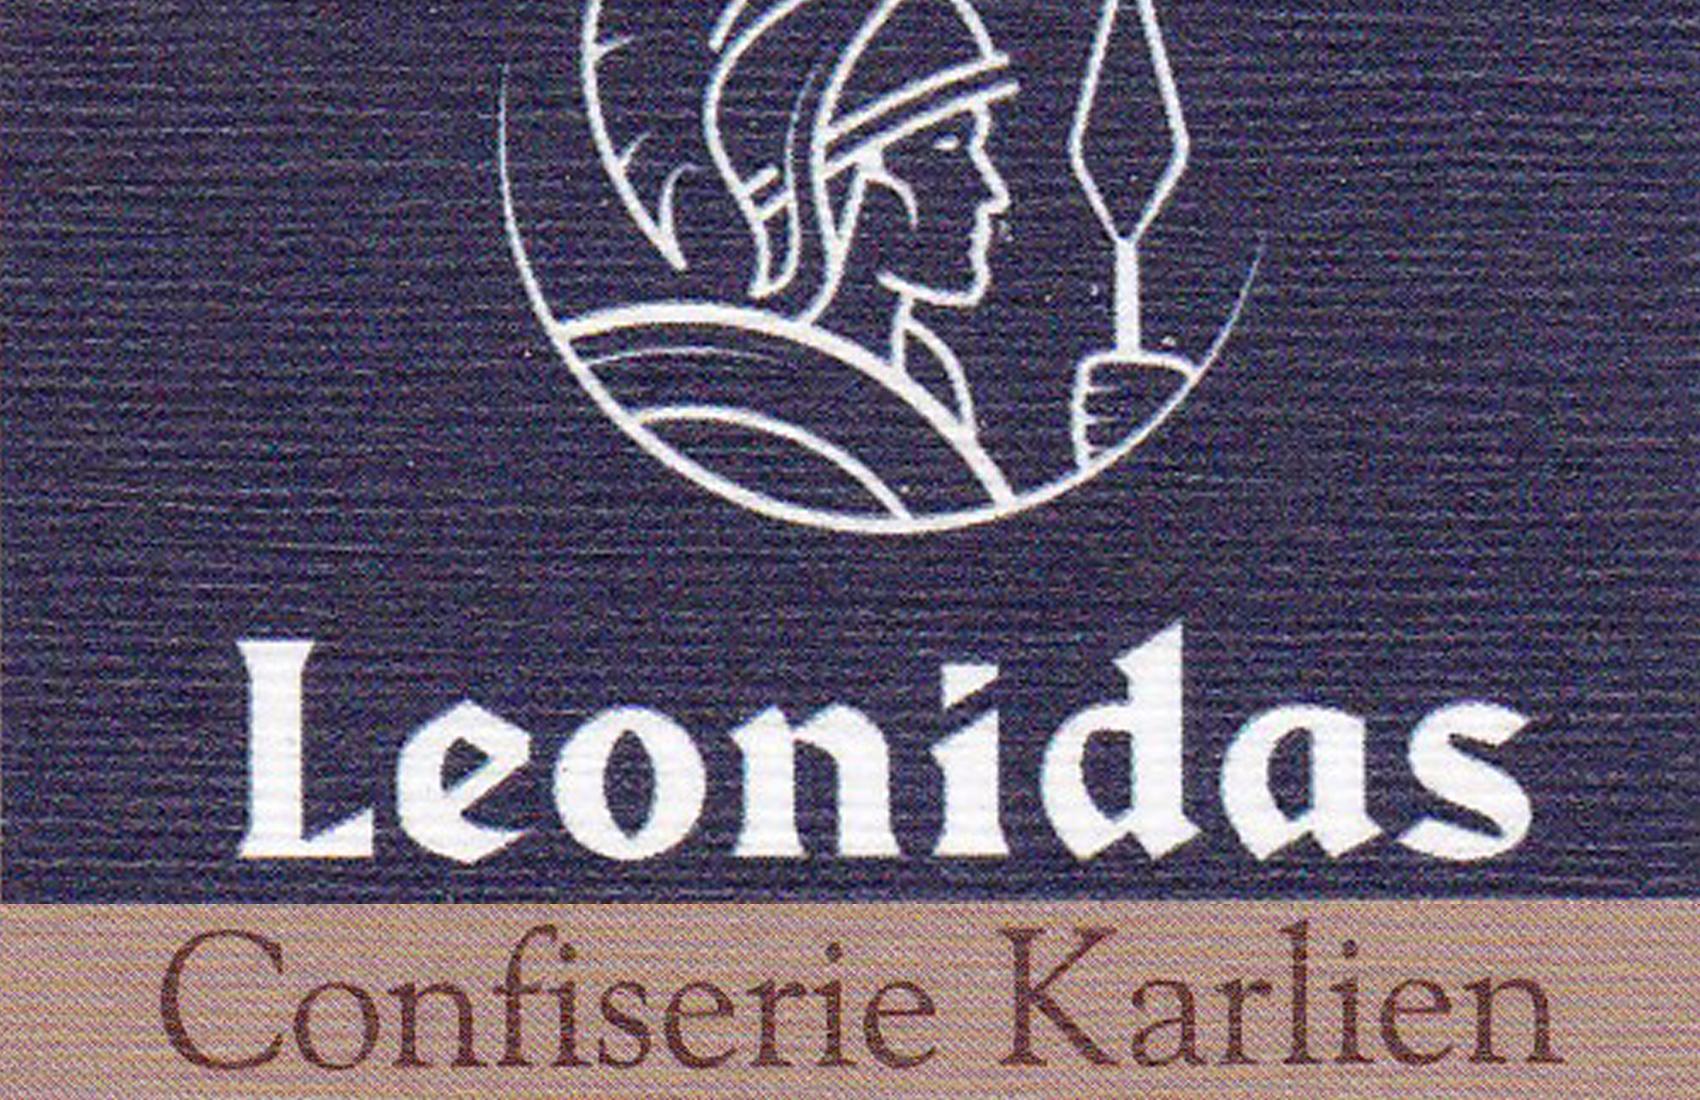 Leonidas - Confiserie Karlien